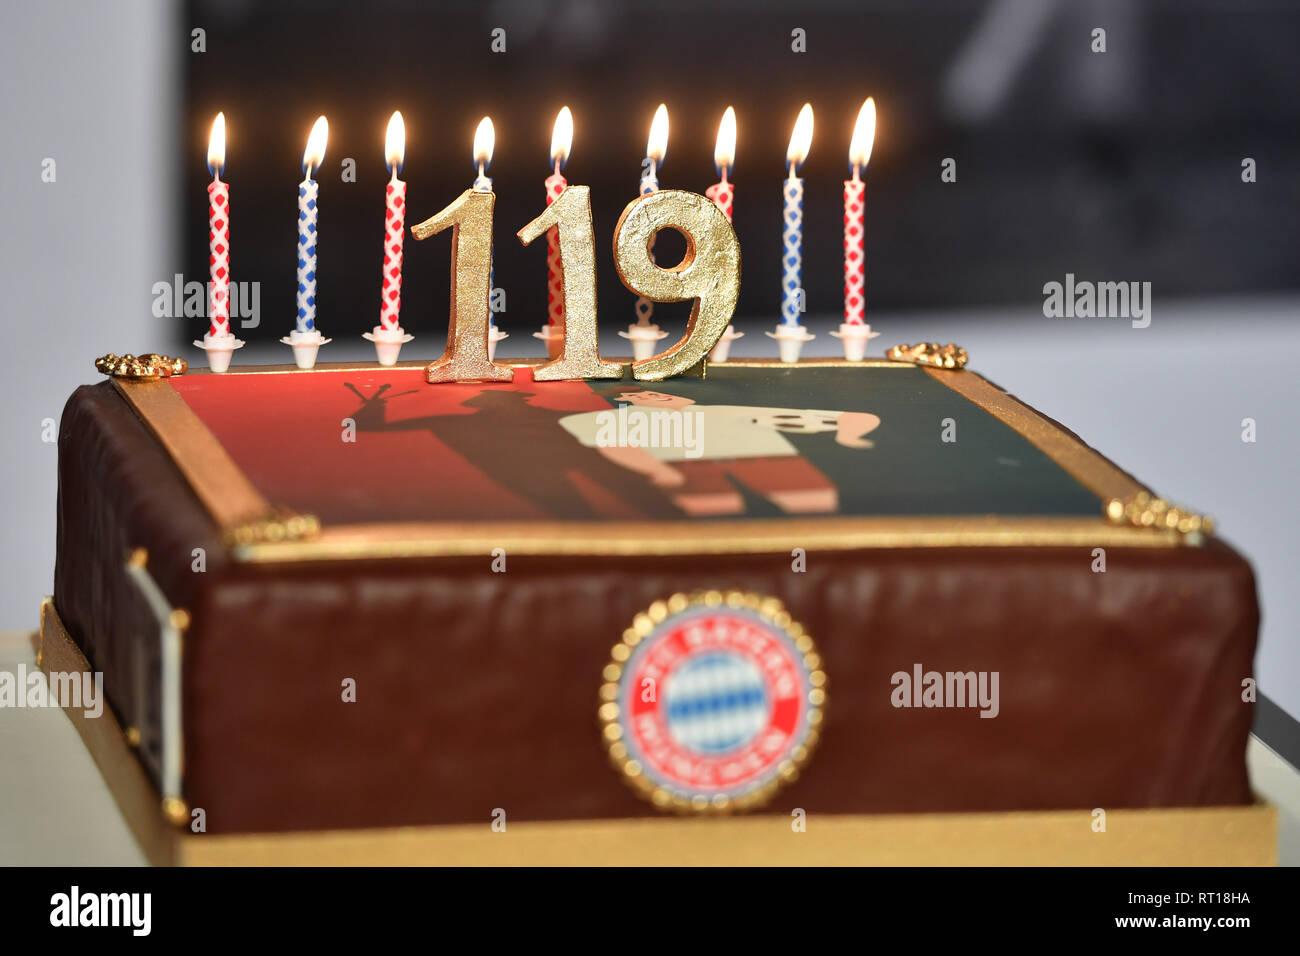 Candles Burn On A Birthday Cake Happy Birthday Fc Bayern On The